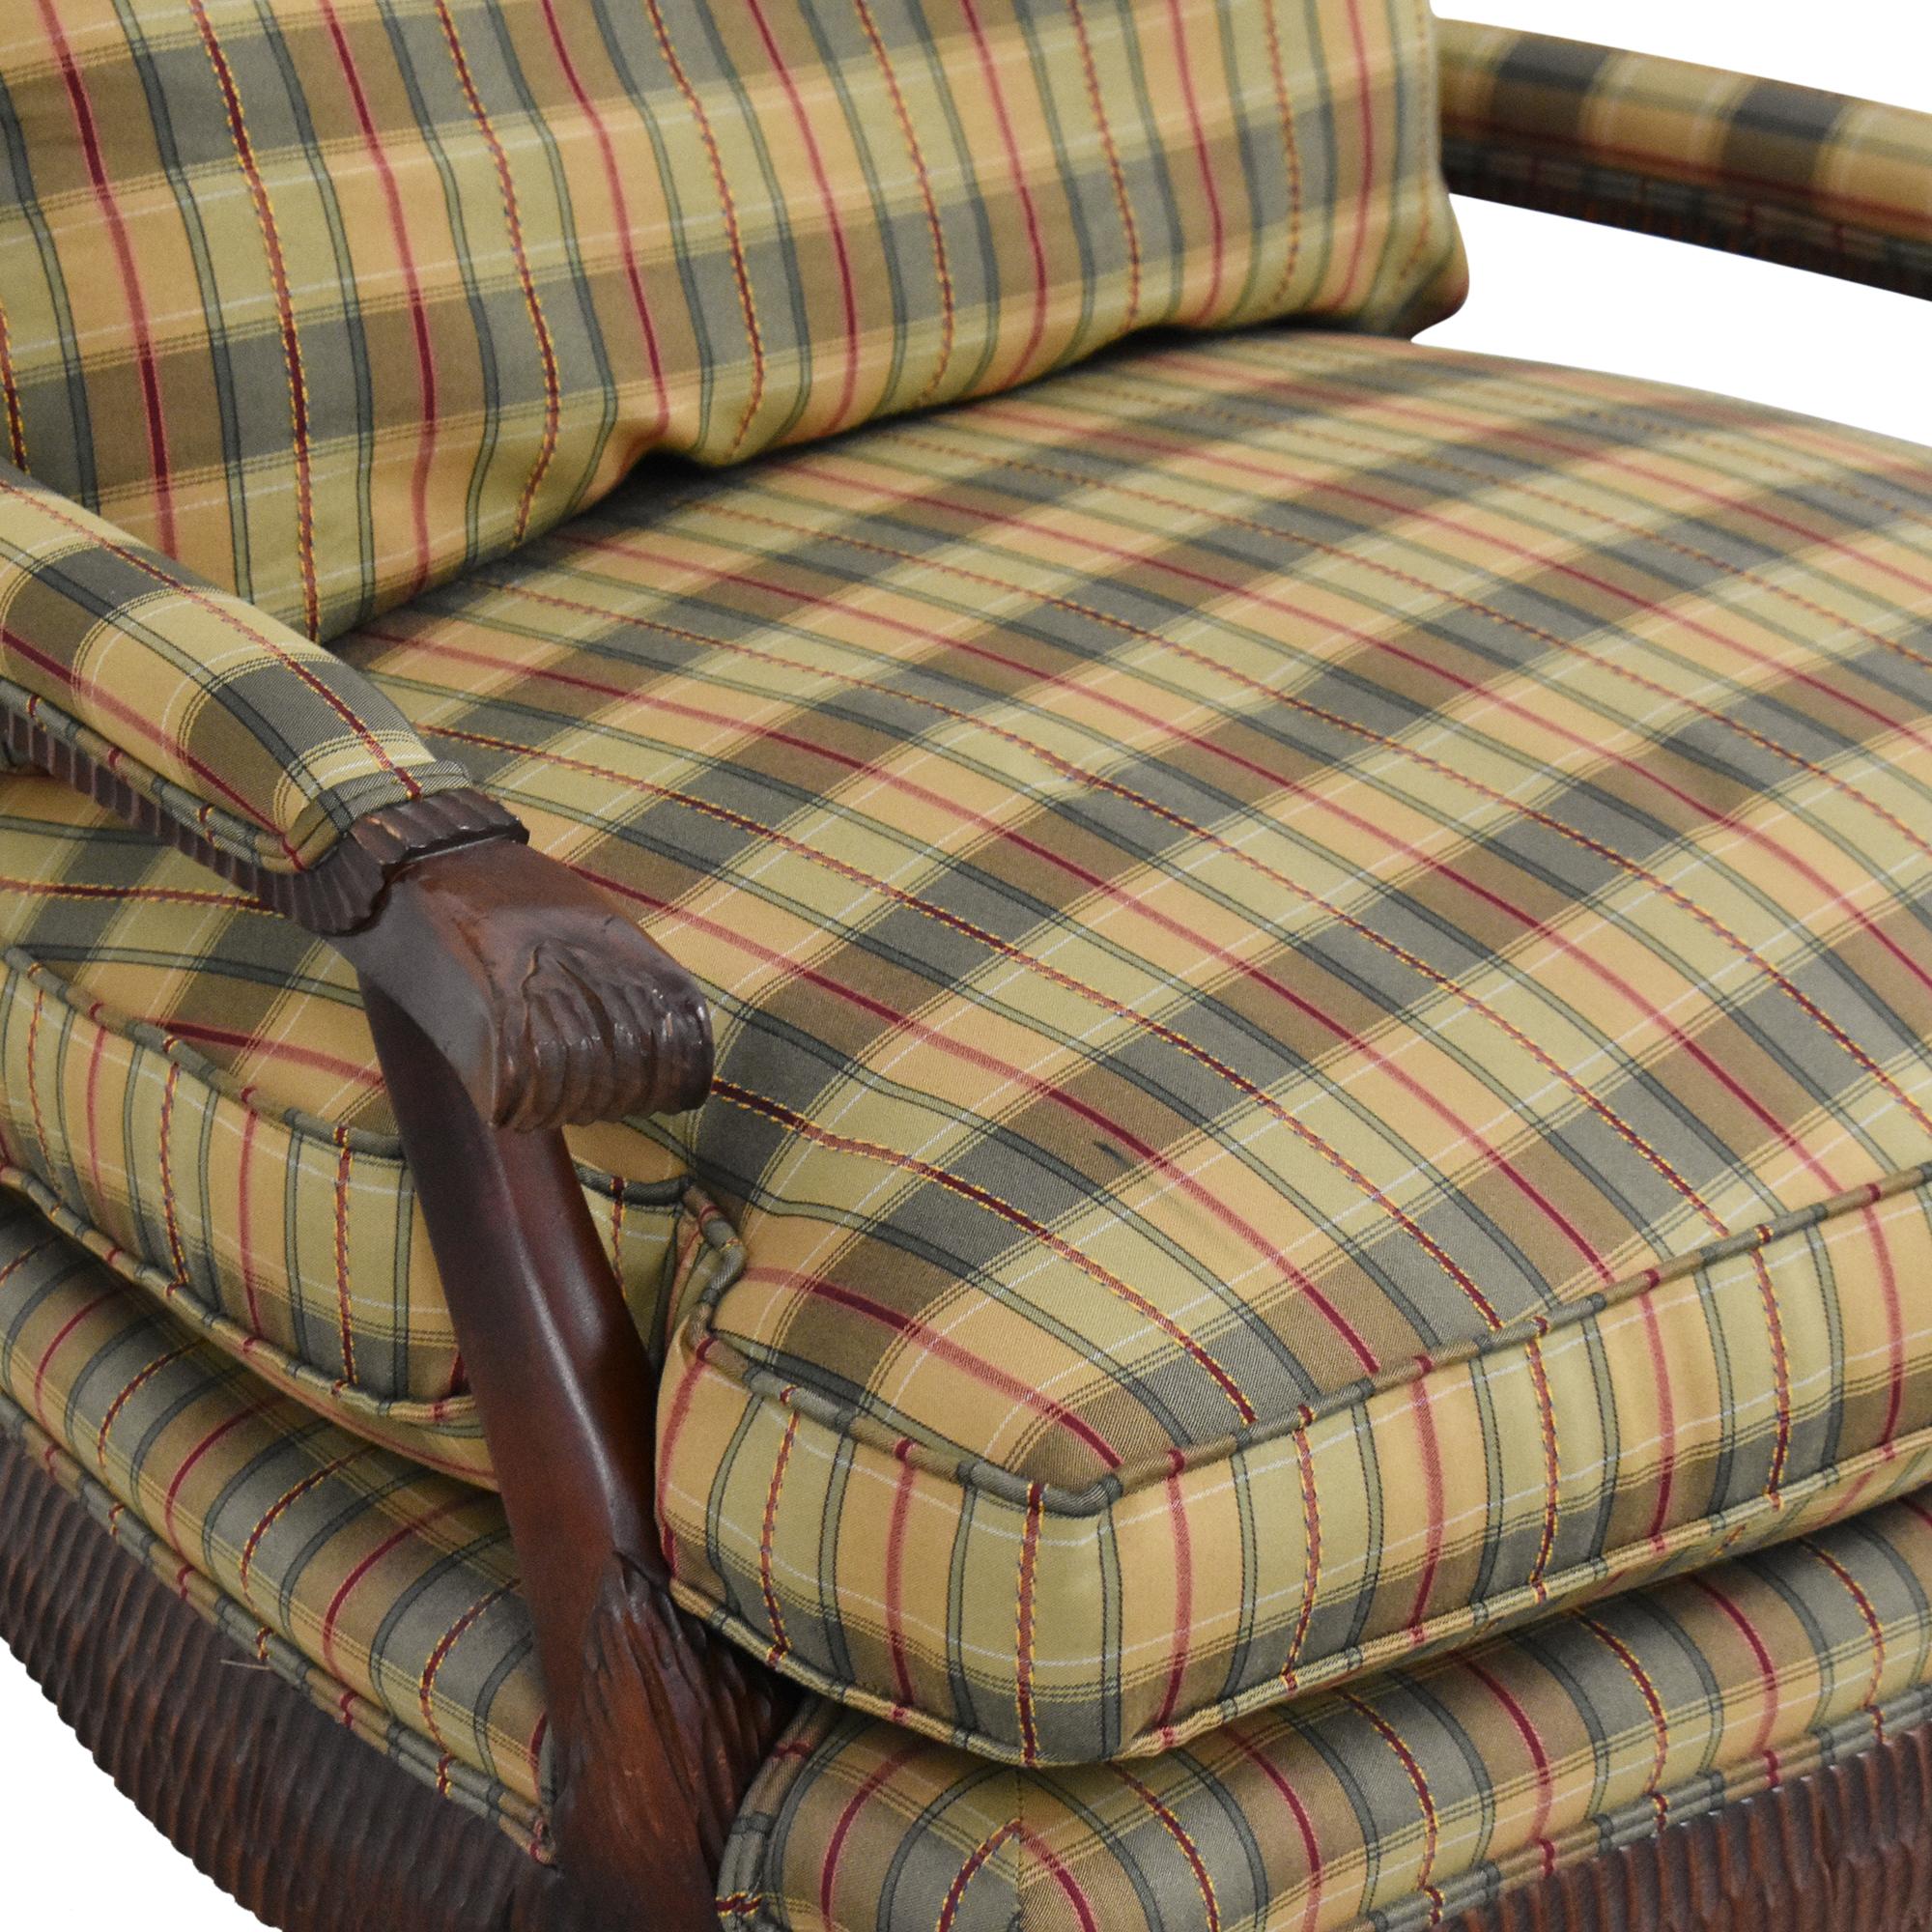 Lexington Furniture Lexington Furniture Upholstered Accent Chair on sale